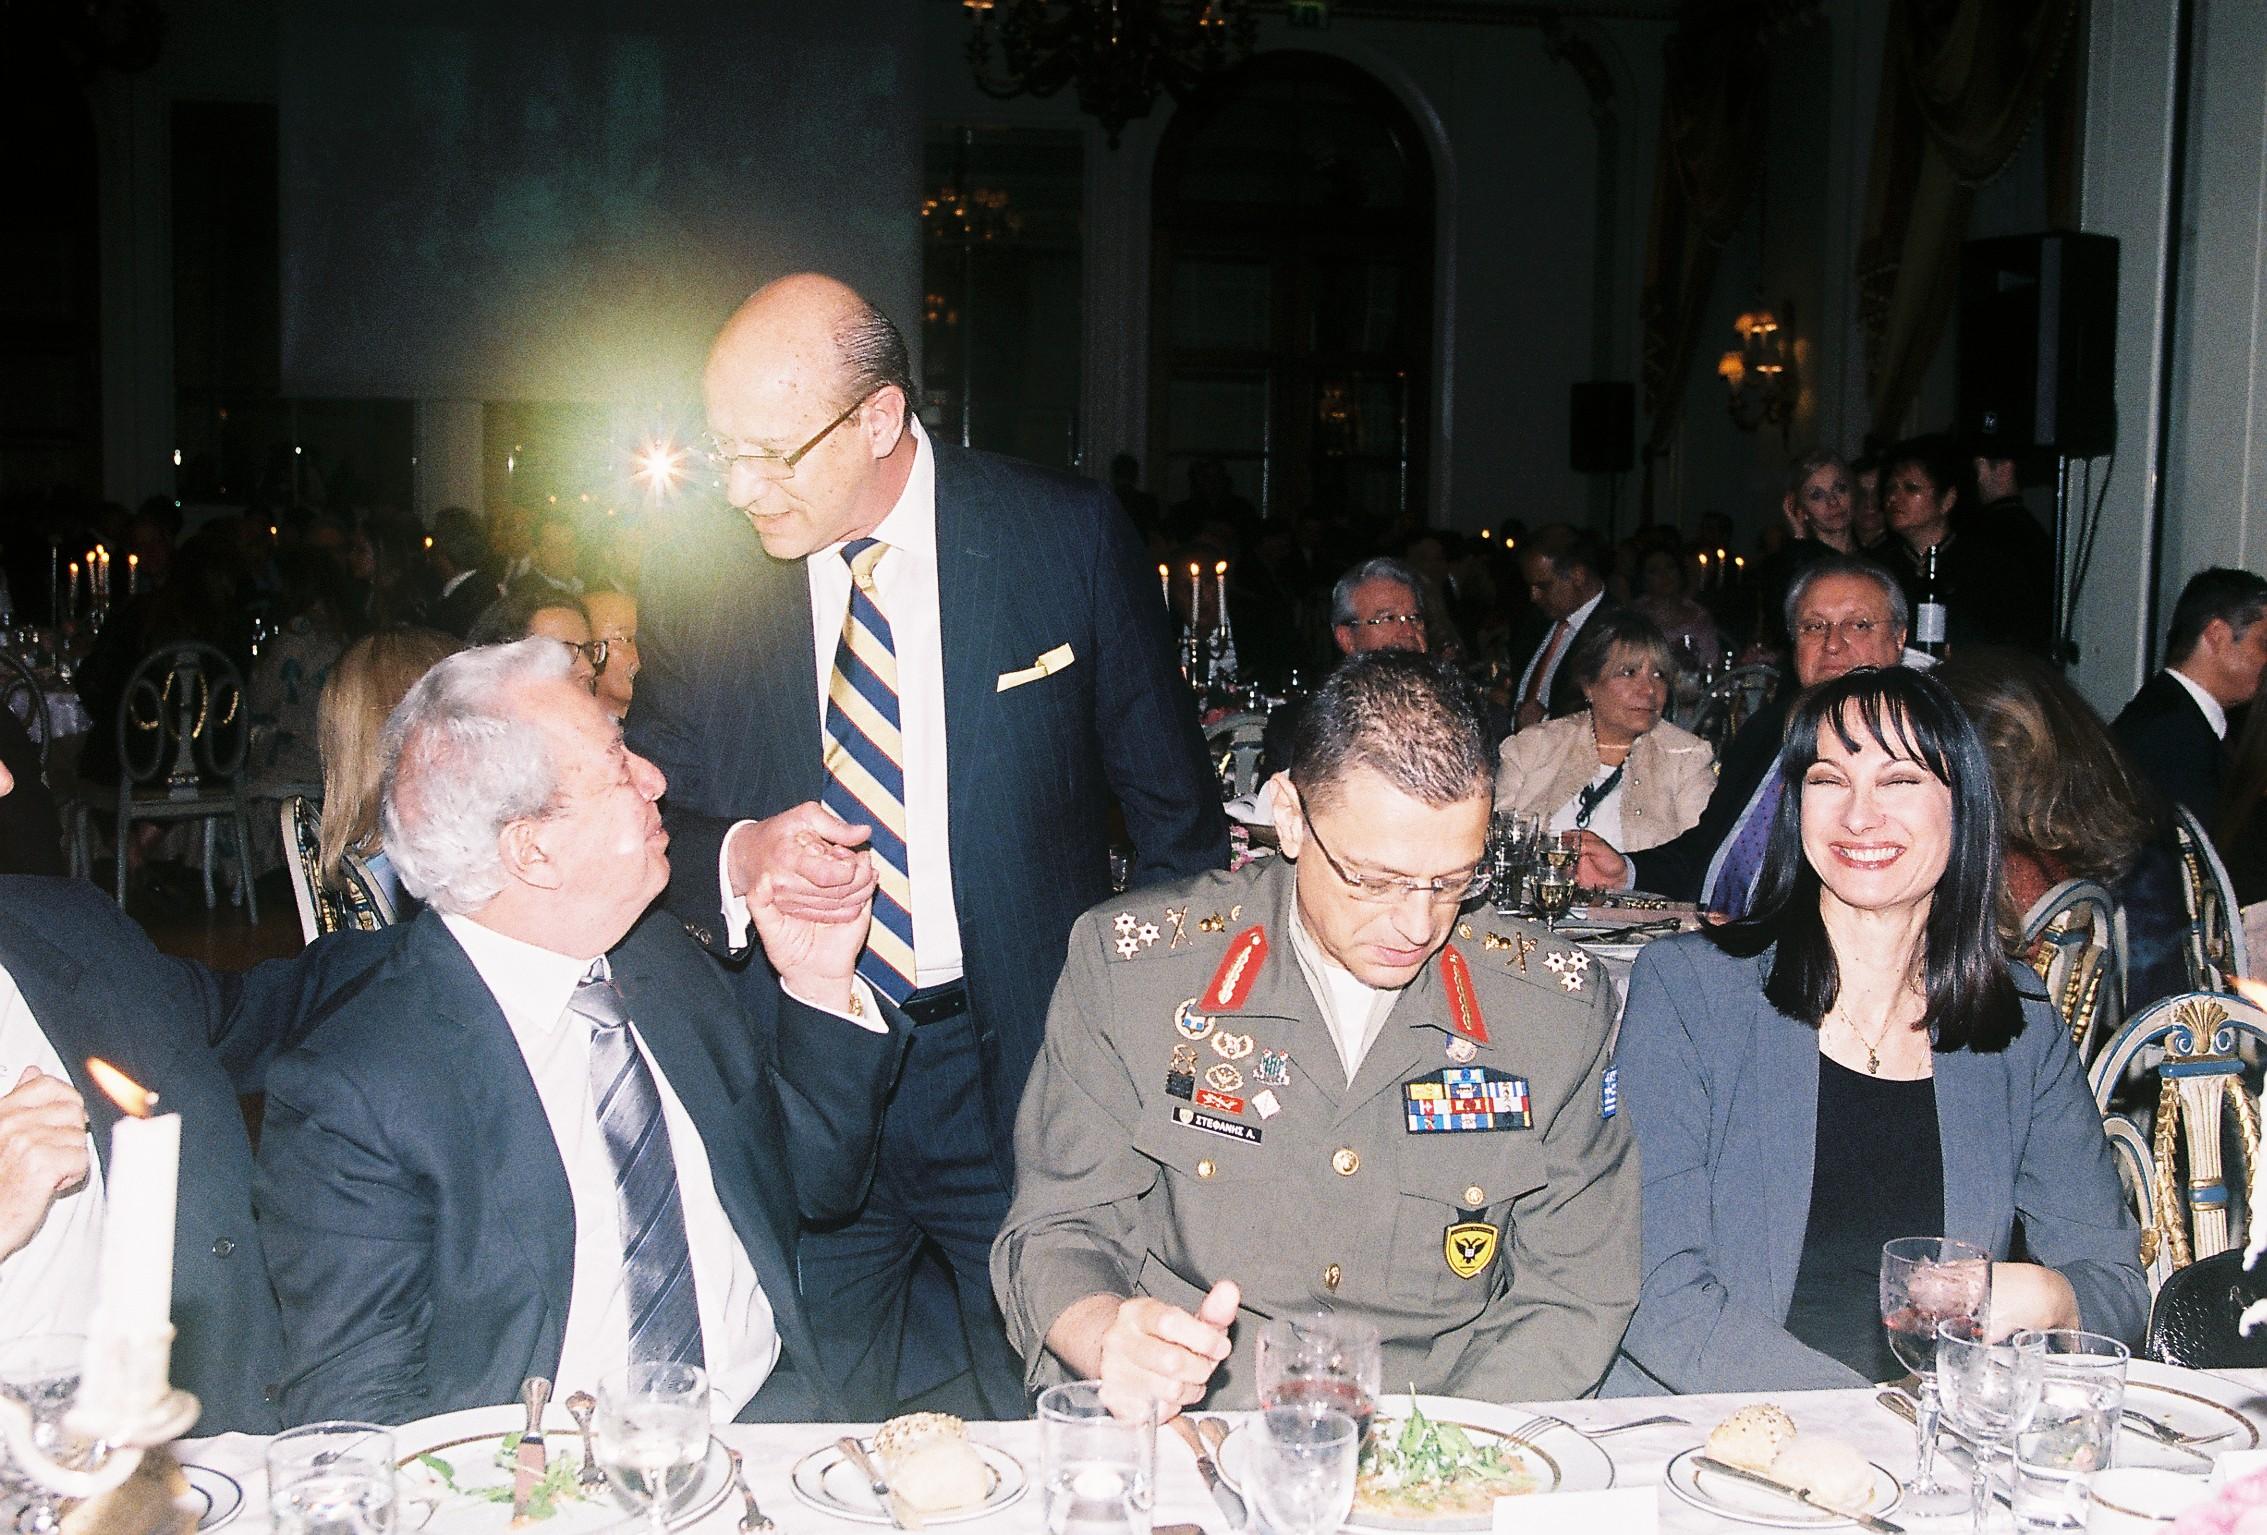 George Economou; Constantine Galanis; Lt. General Alkiviadis Stefanis, Chief of the Hellenic Army; Elena Kountoura, Minister of Tourism